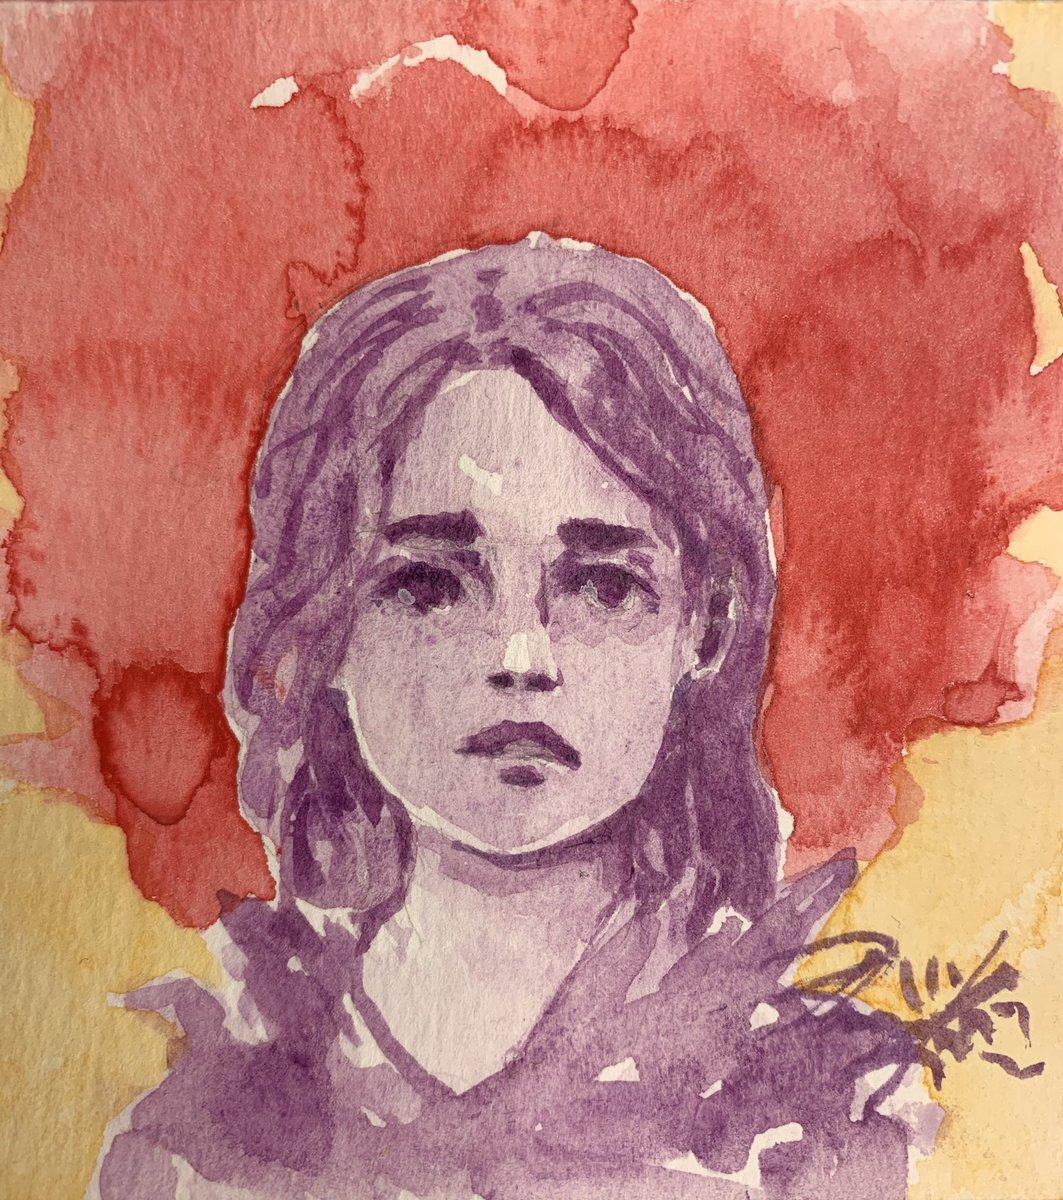 """Longing.""   #OsoAstral #Art #Mixedmedia #Painting #Drawing #Watercolor #Ink #Graphite #Gouache #InstaArtist #TexasArtist #ElPasoArtist #ElPasoStrong #Schmincke #Winsorandnewtonpic.twitter.com/EKR1QGNbdY"